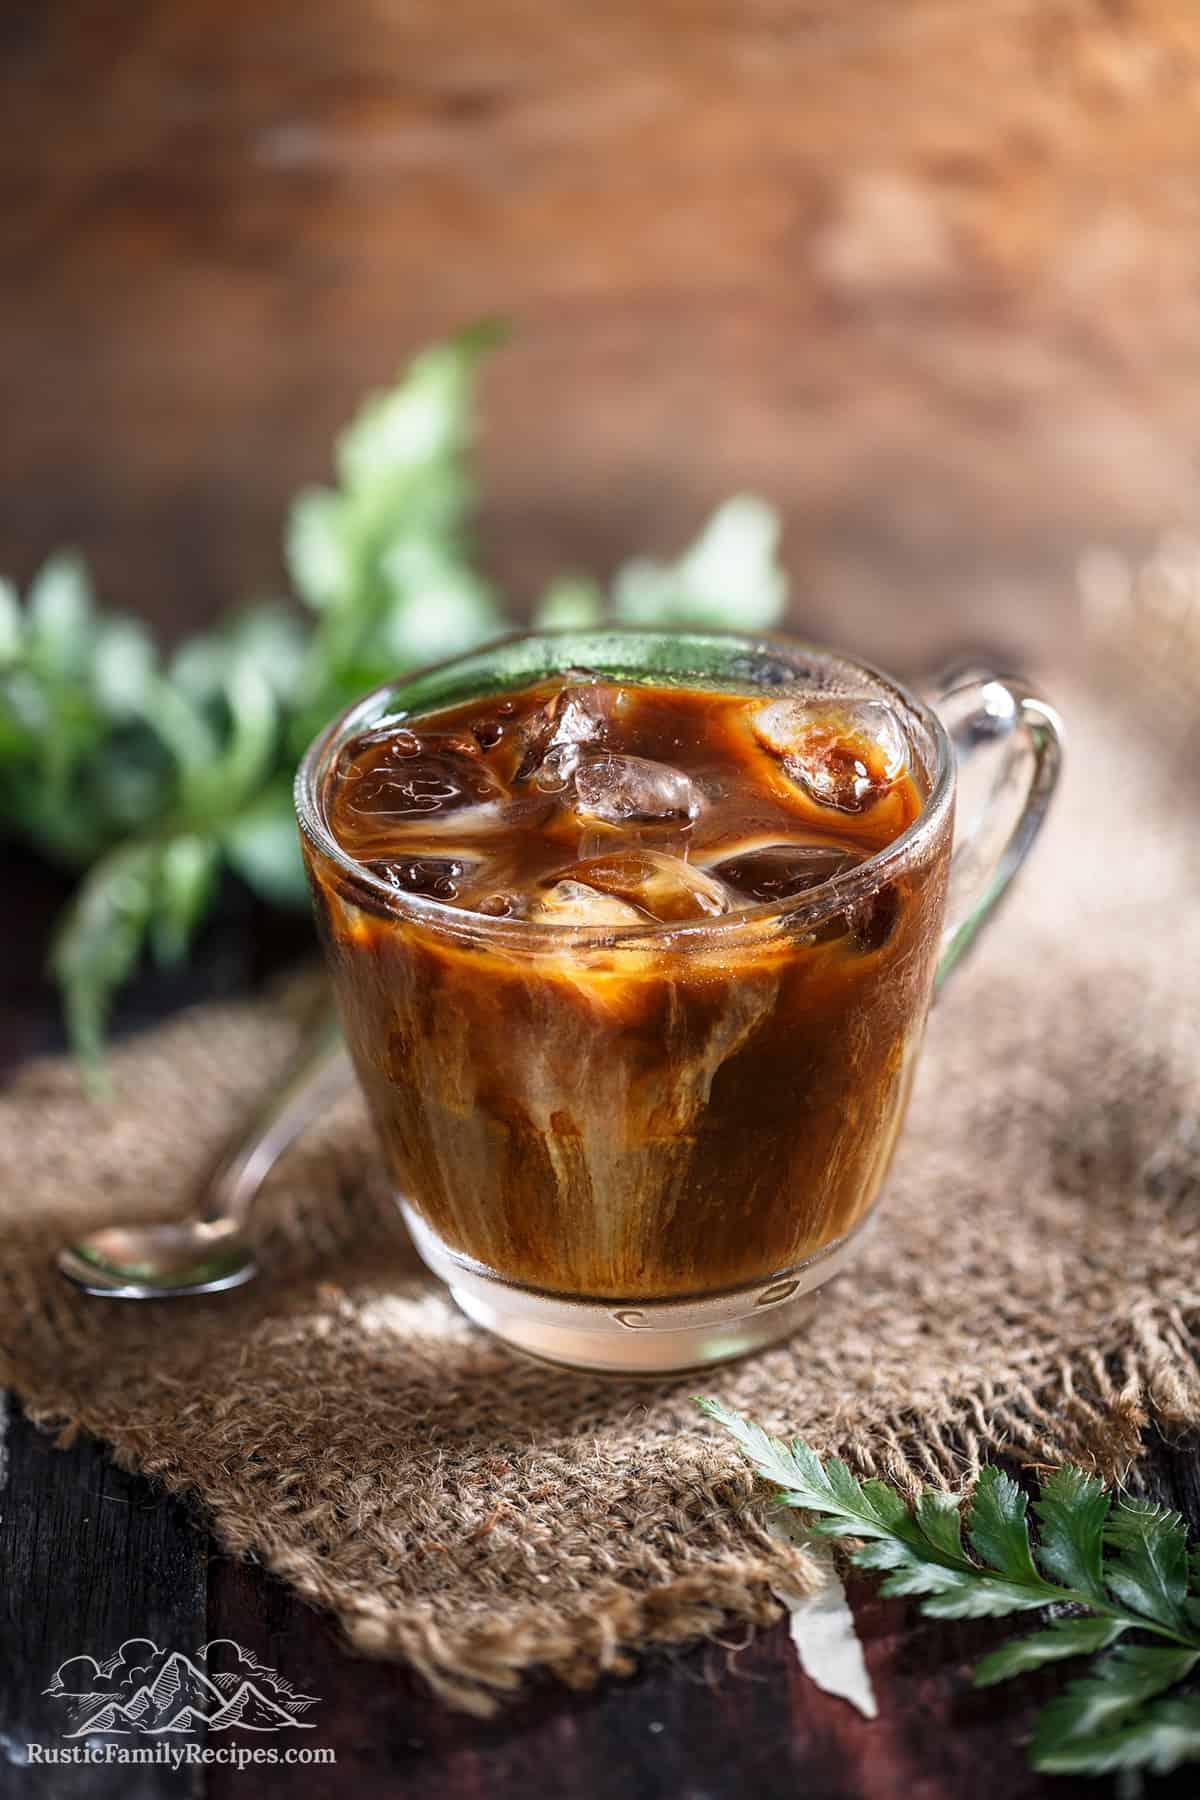 A glass mug with cardamom iced coffee